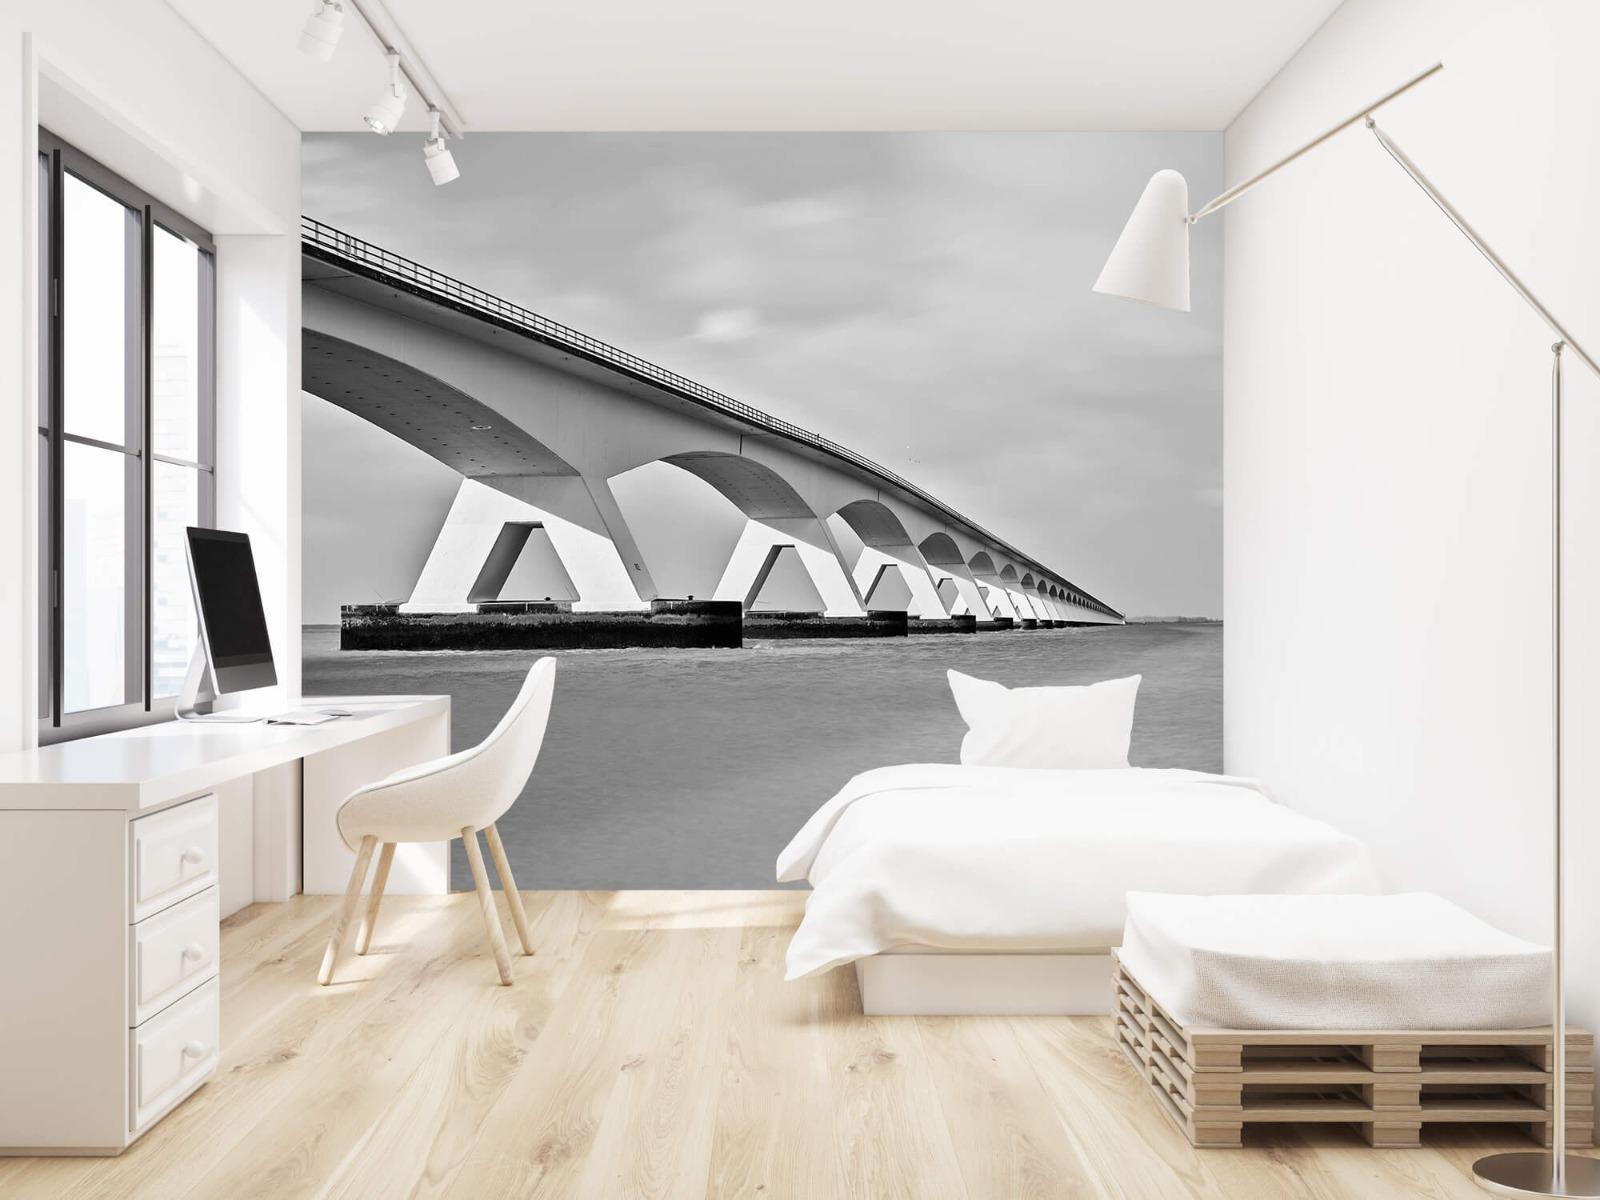 Zwart Wit behang - Lange brug - Kantoor 22